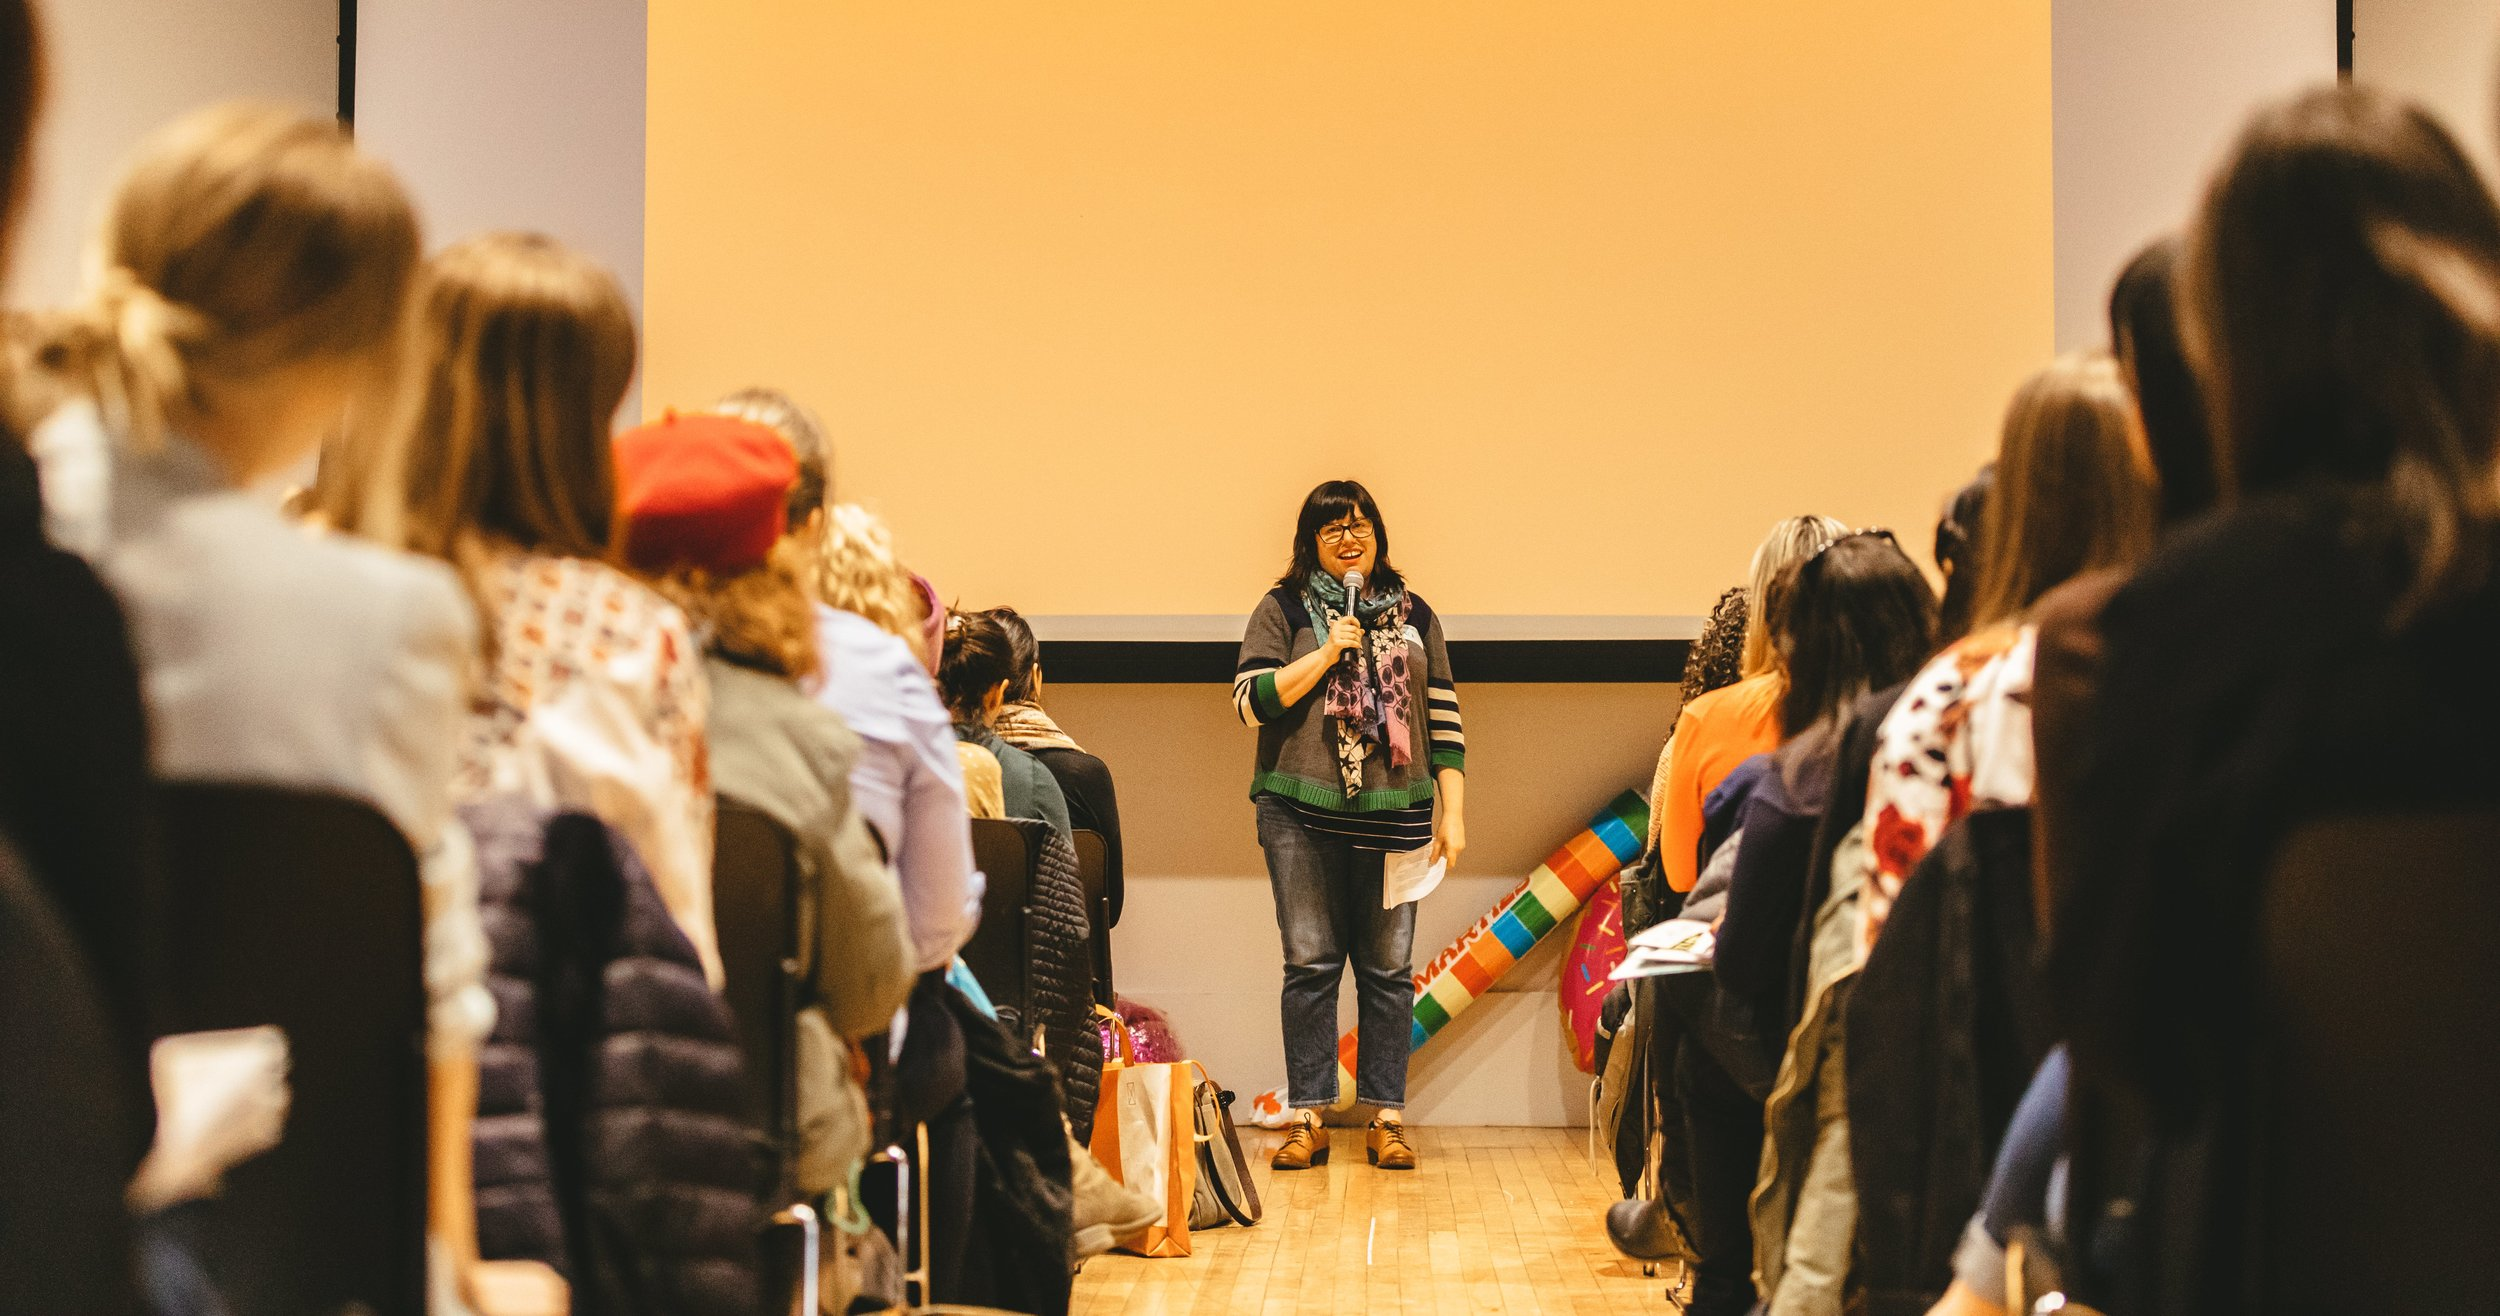 2018-PDX-Creative-Women-Unite-72-min.jpg